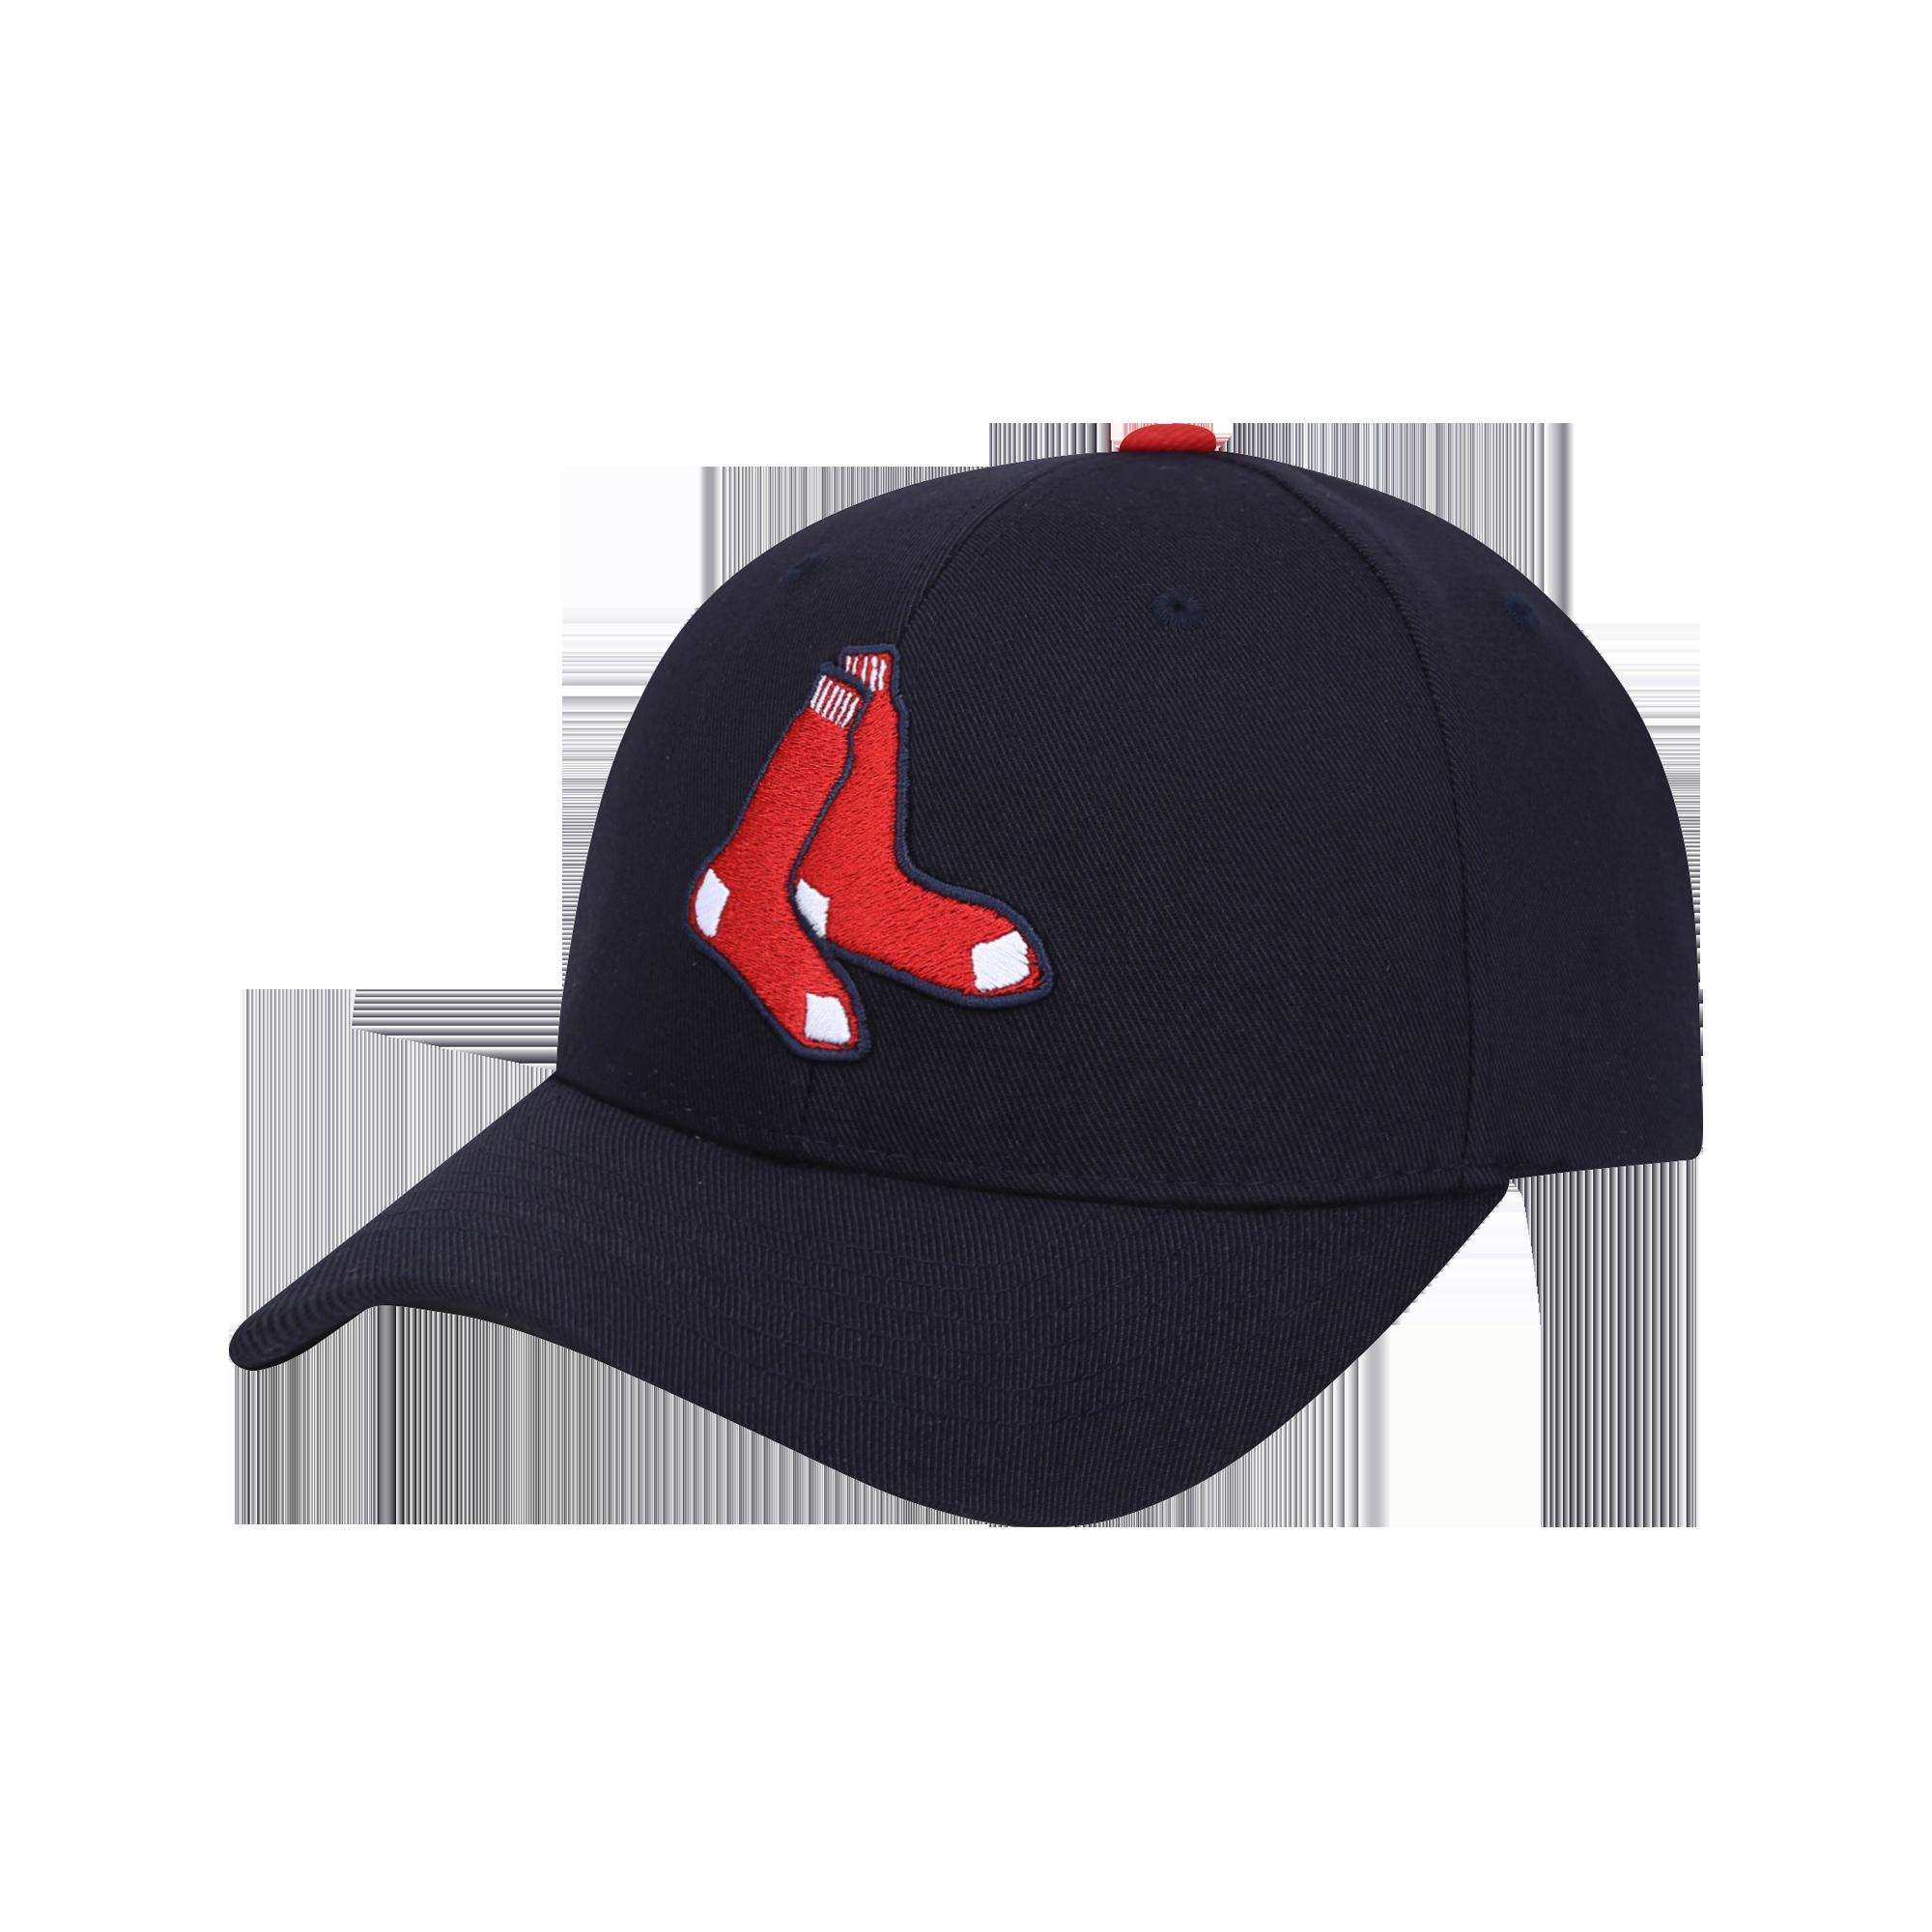 BOSTON RED SOX CAPTAIN MASCOT ADJUSTABLE CAP